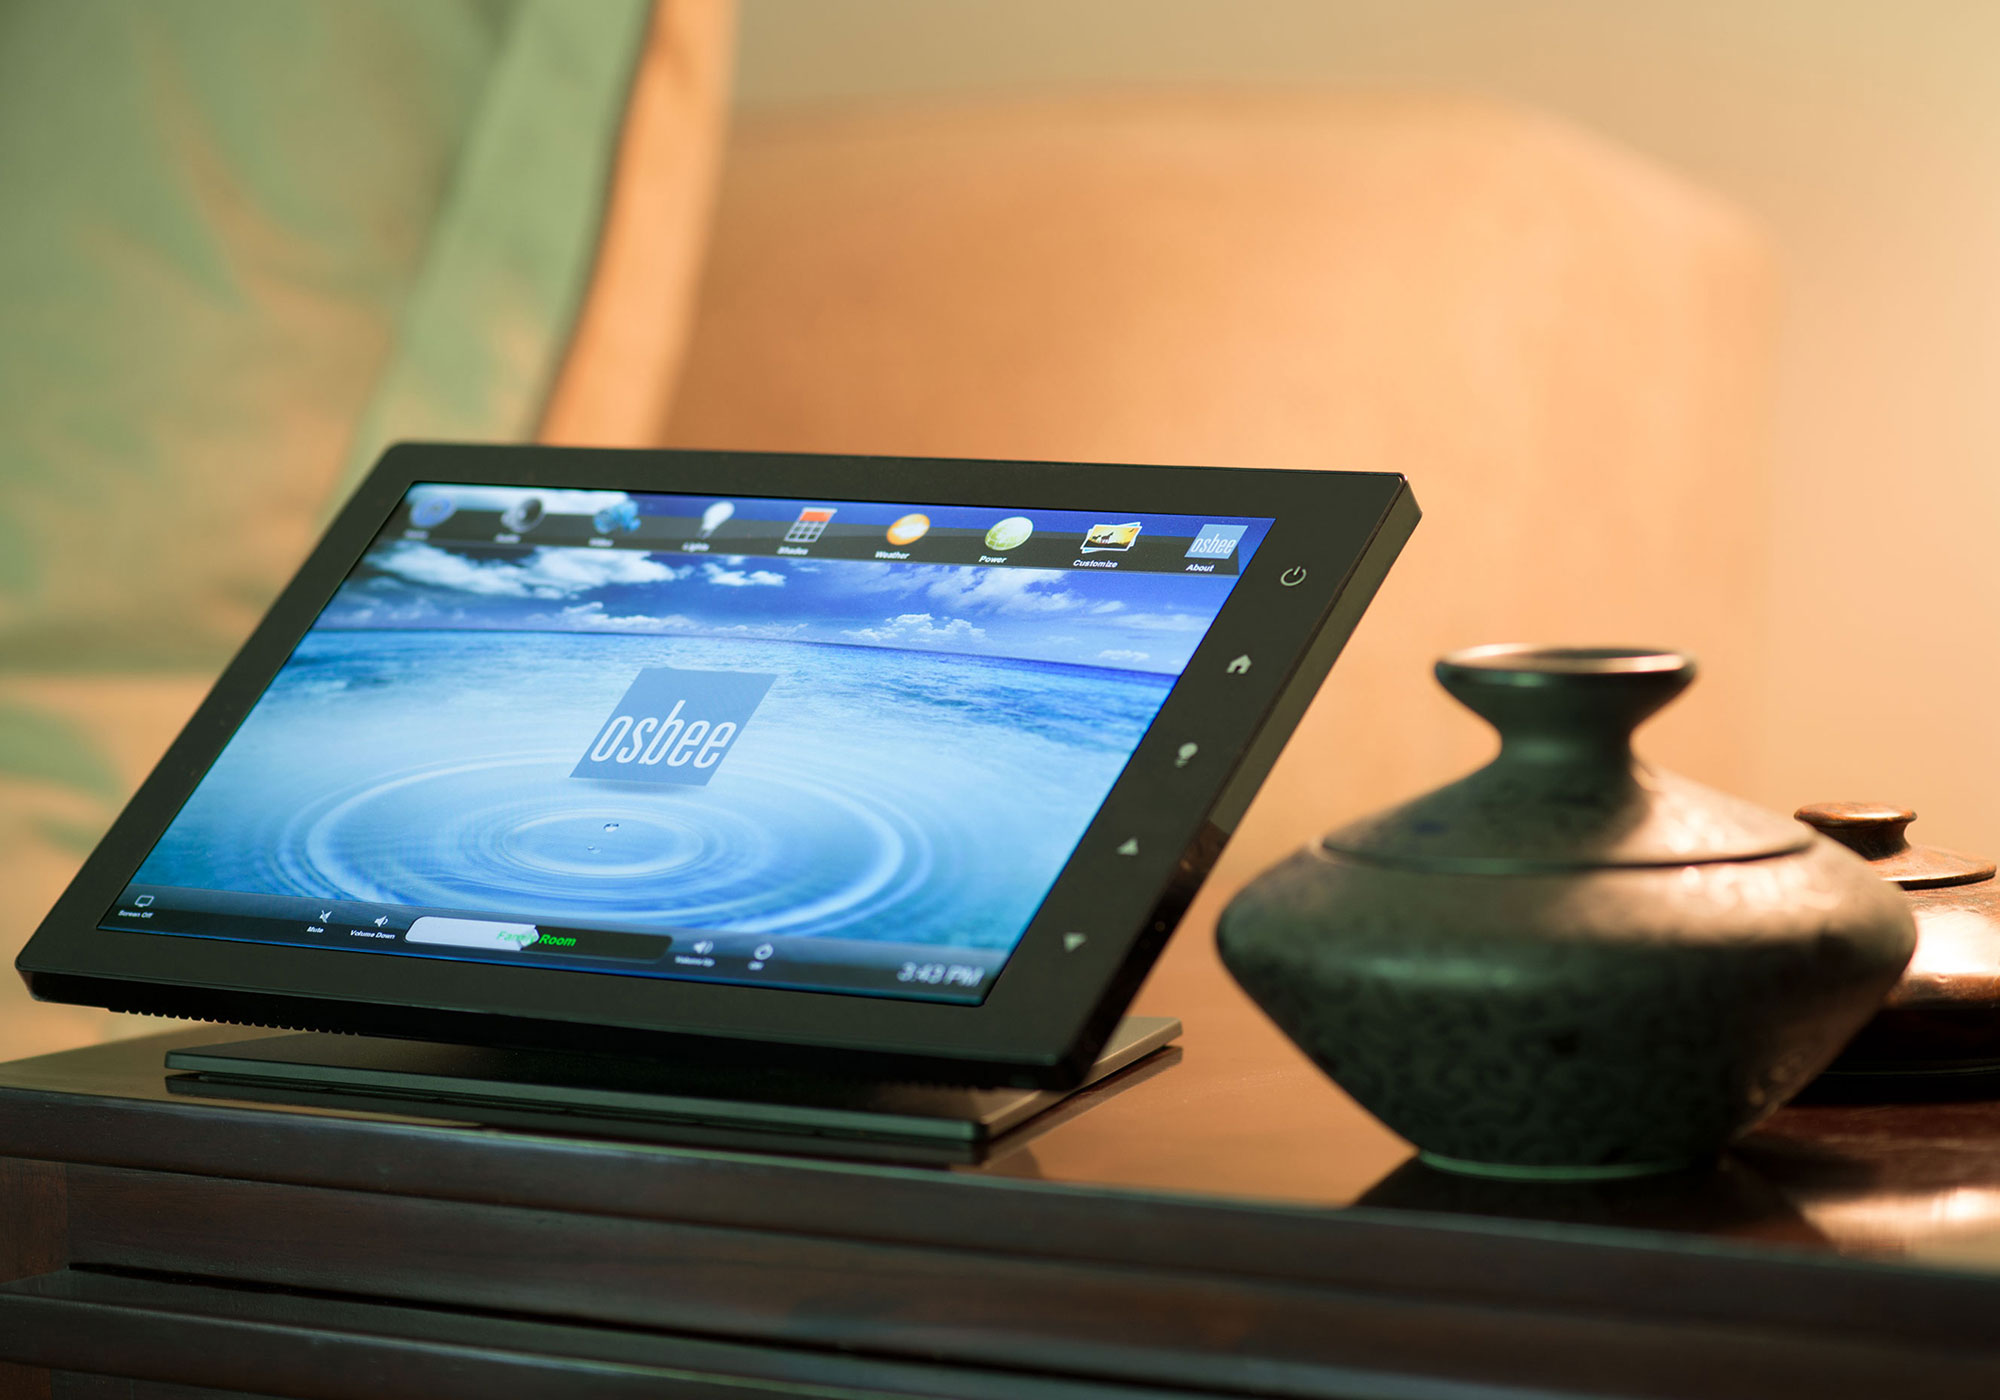 touchscreen, tabletop touchscreen, home screen